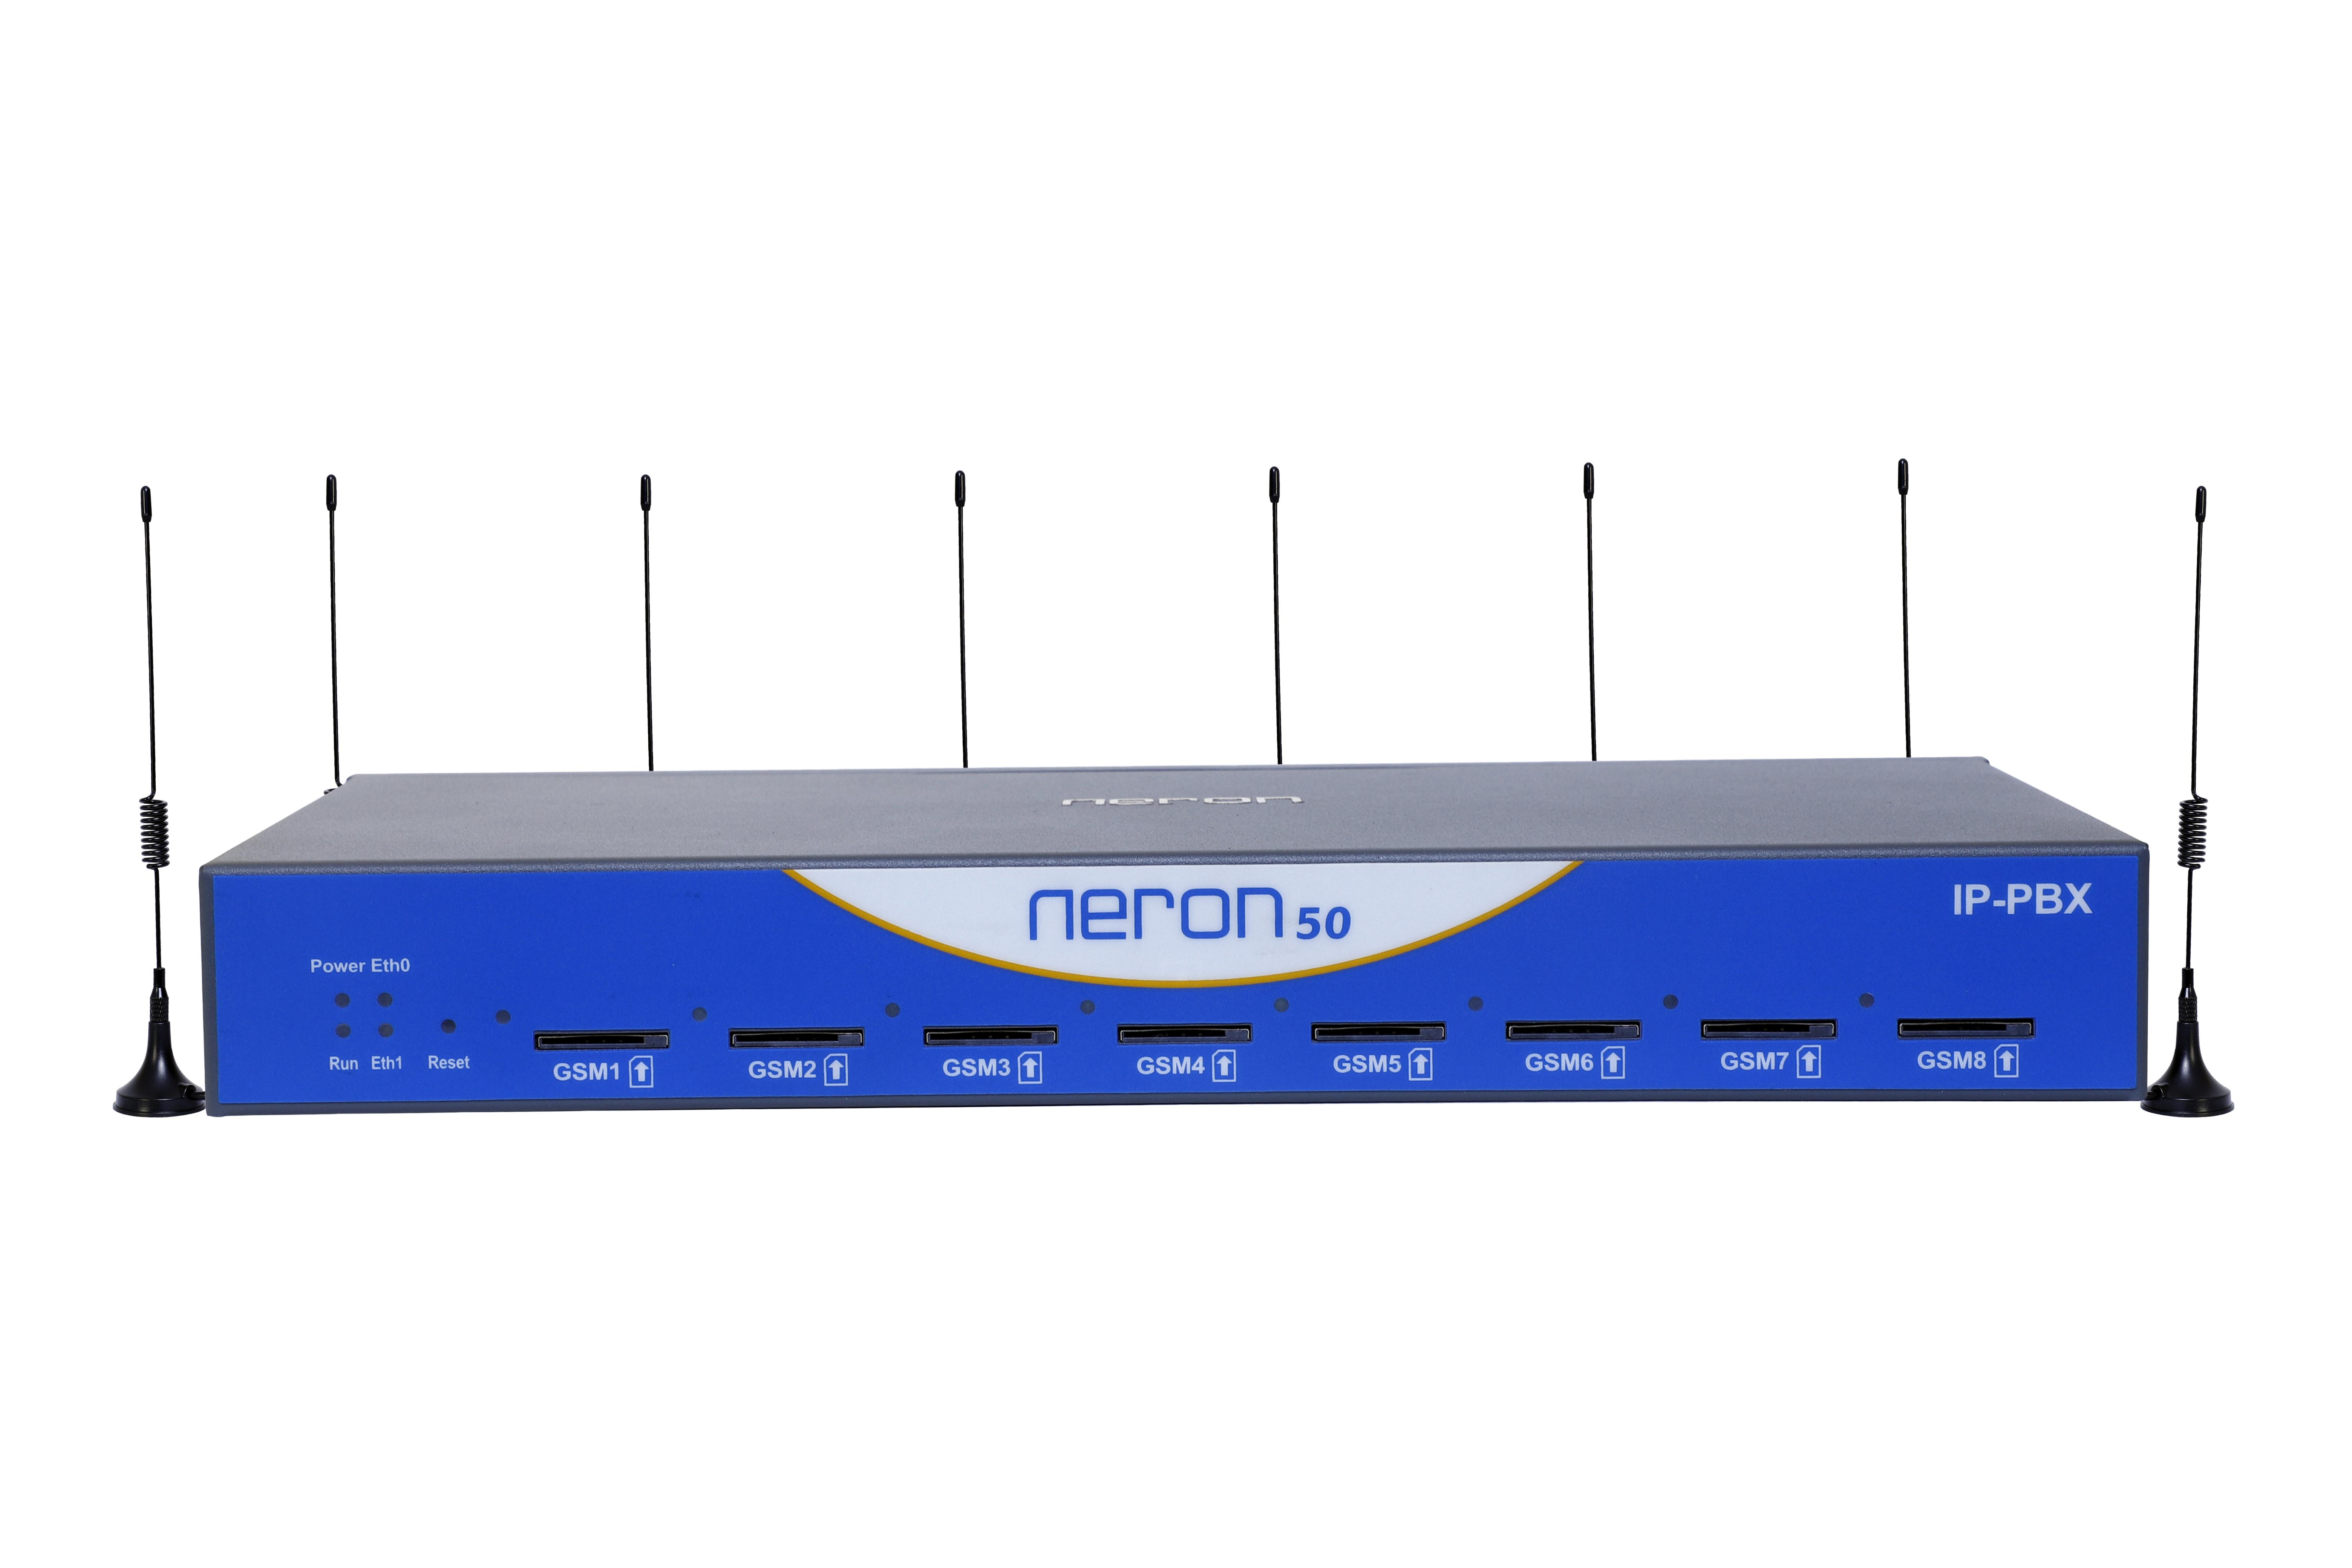 Neron 50-Ip Pbx Systems